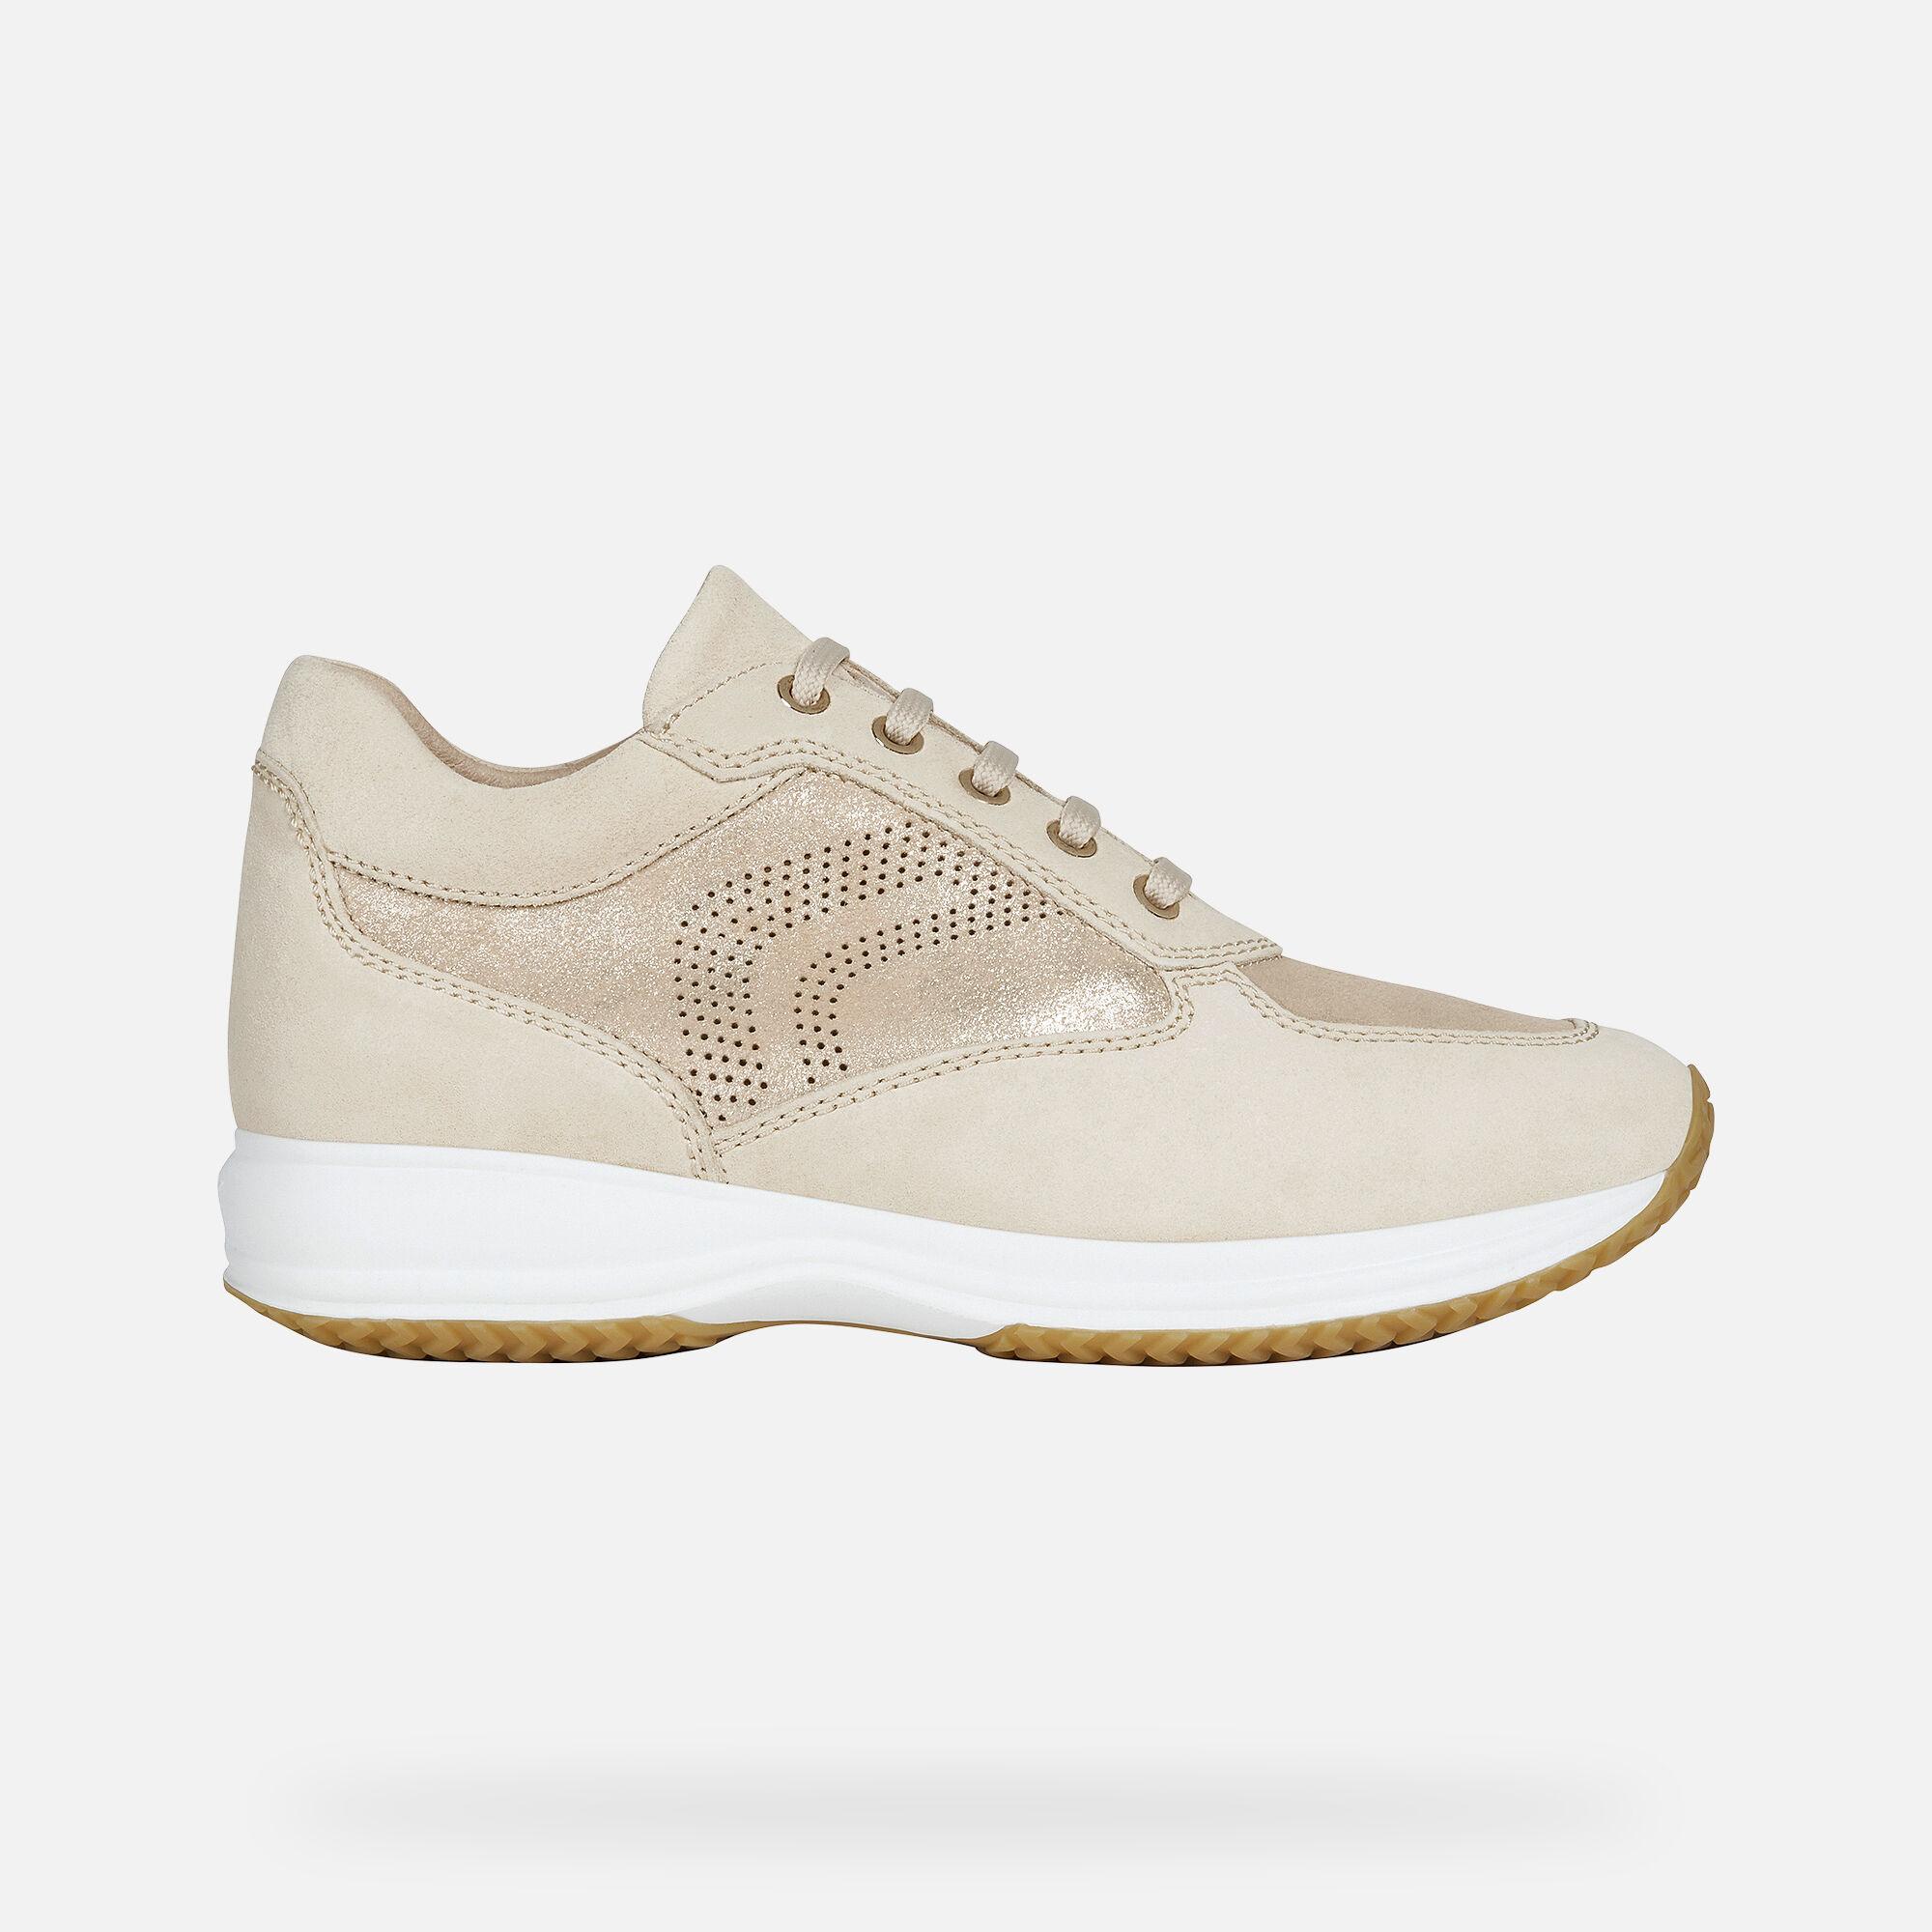 Geox sneakers Geox happy beige